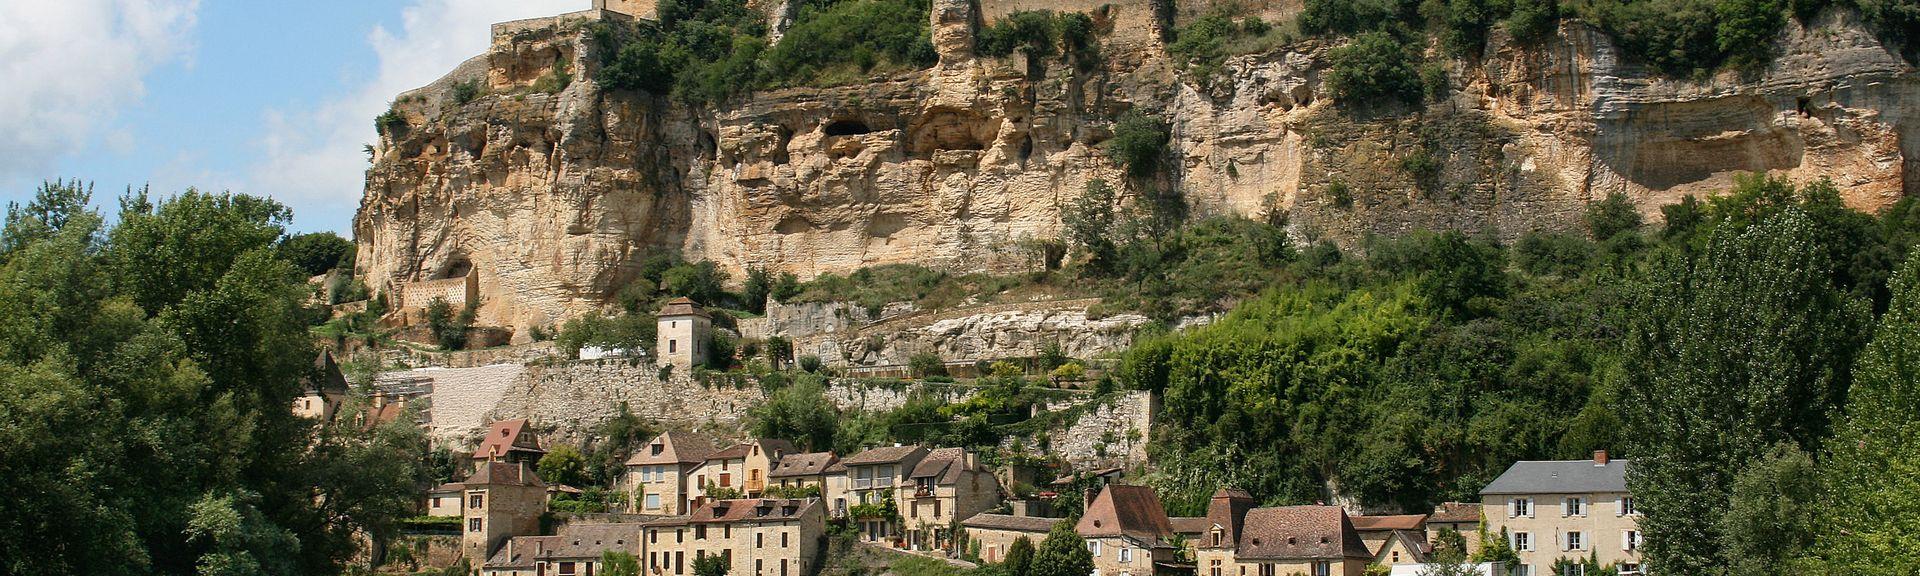 Dordogna, Nouvelle-Aquitaine, Francia